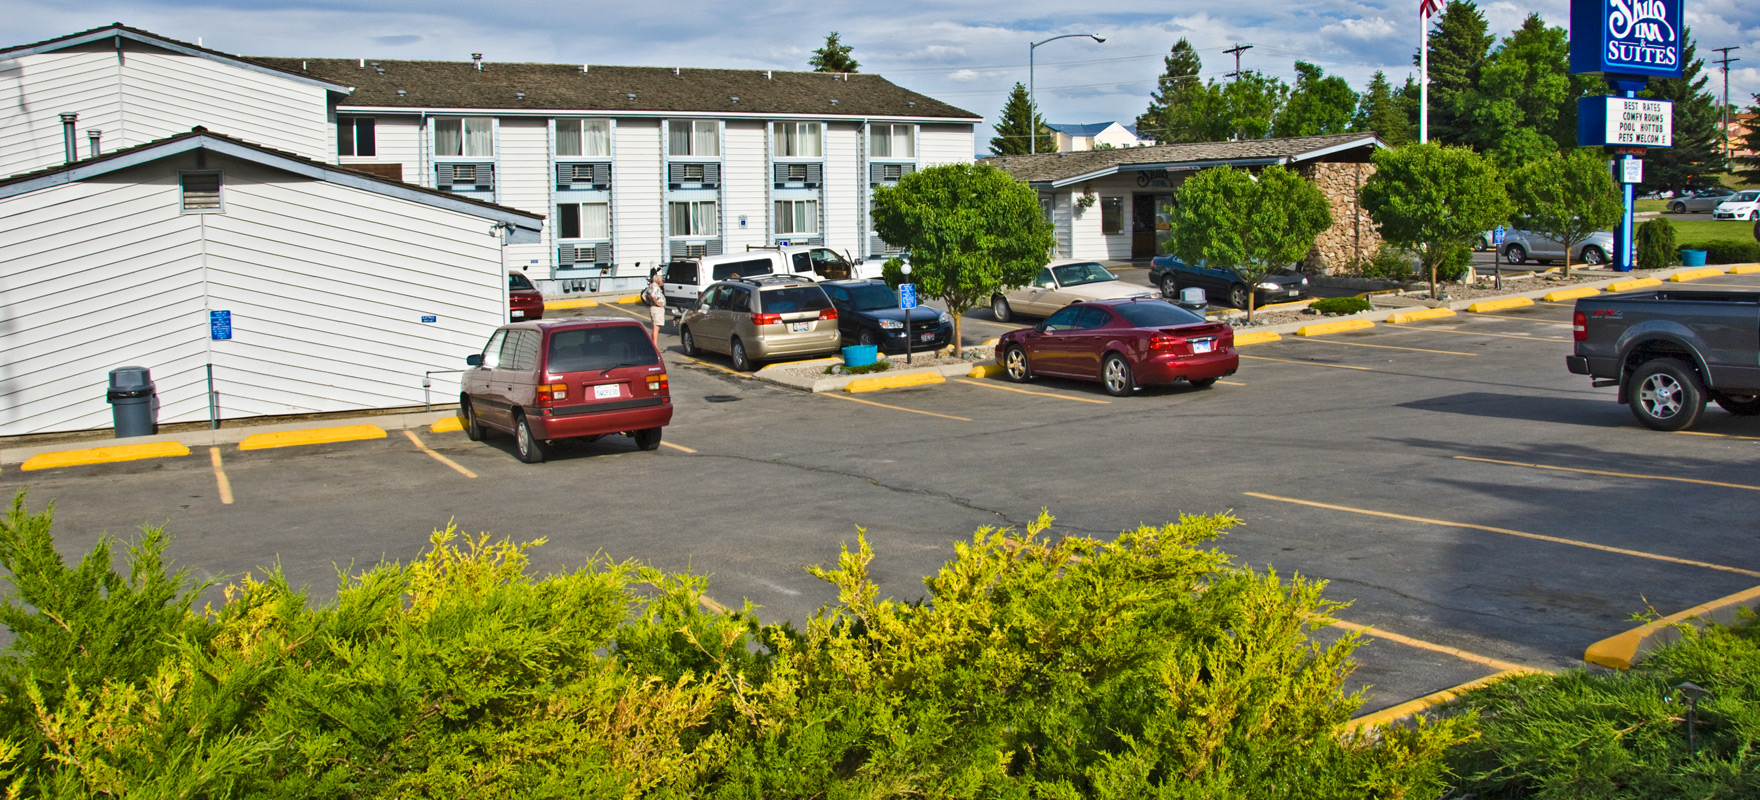 Shilo Inns Suites Hotels Helena Montana